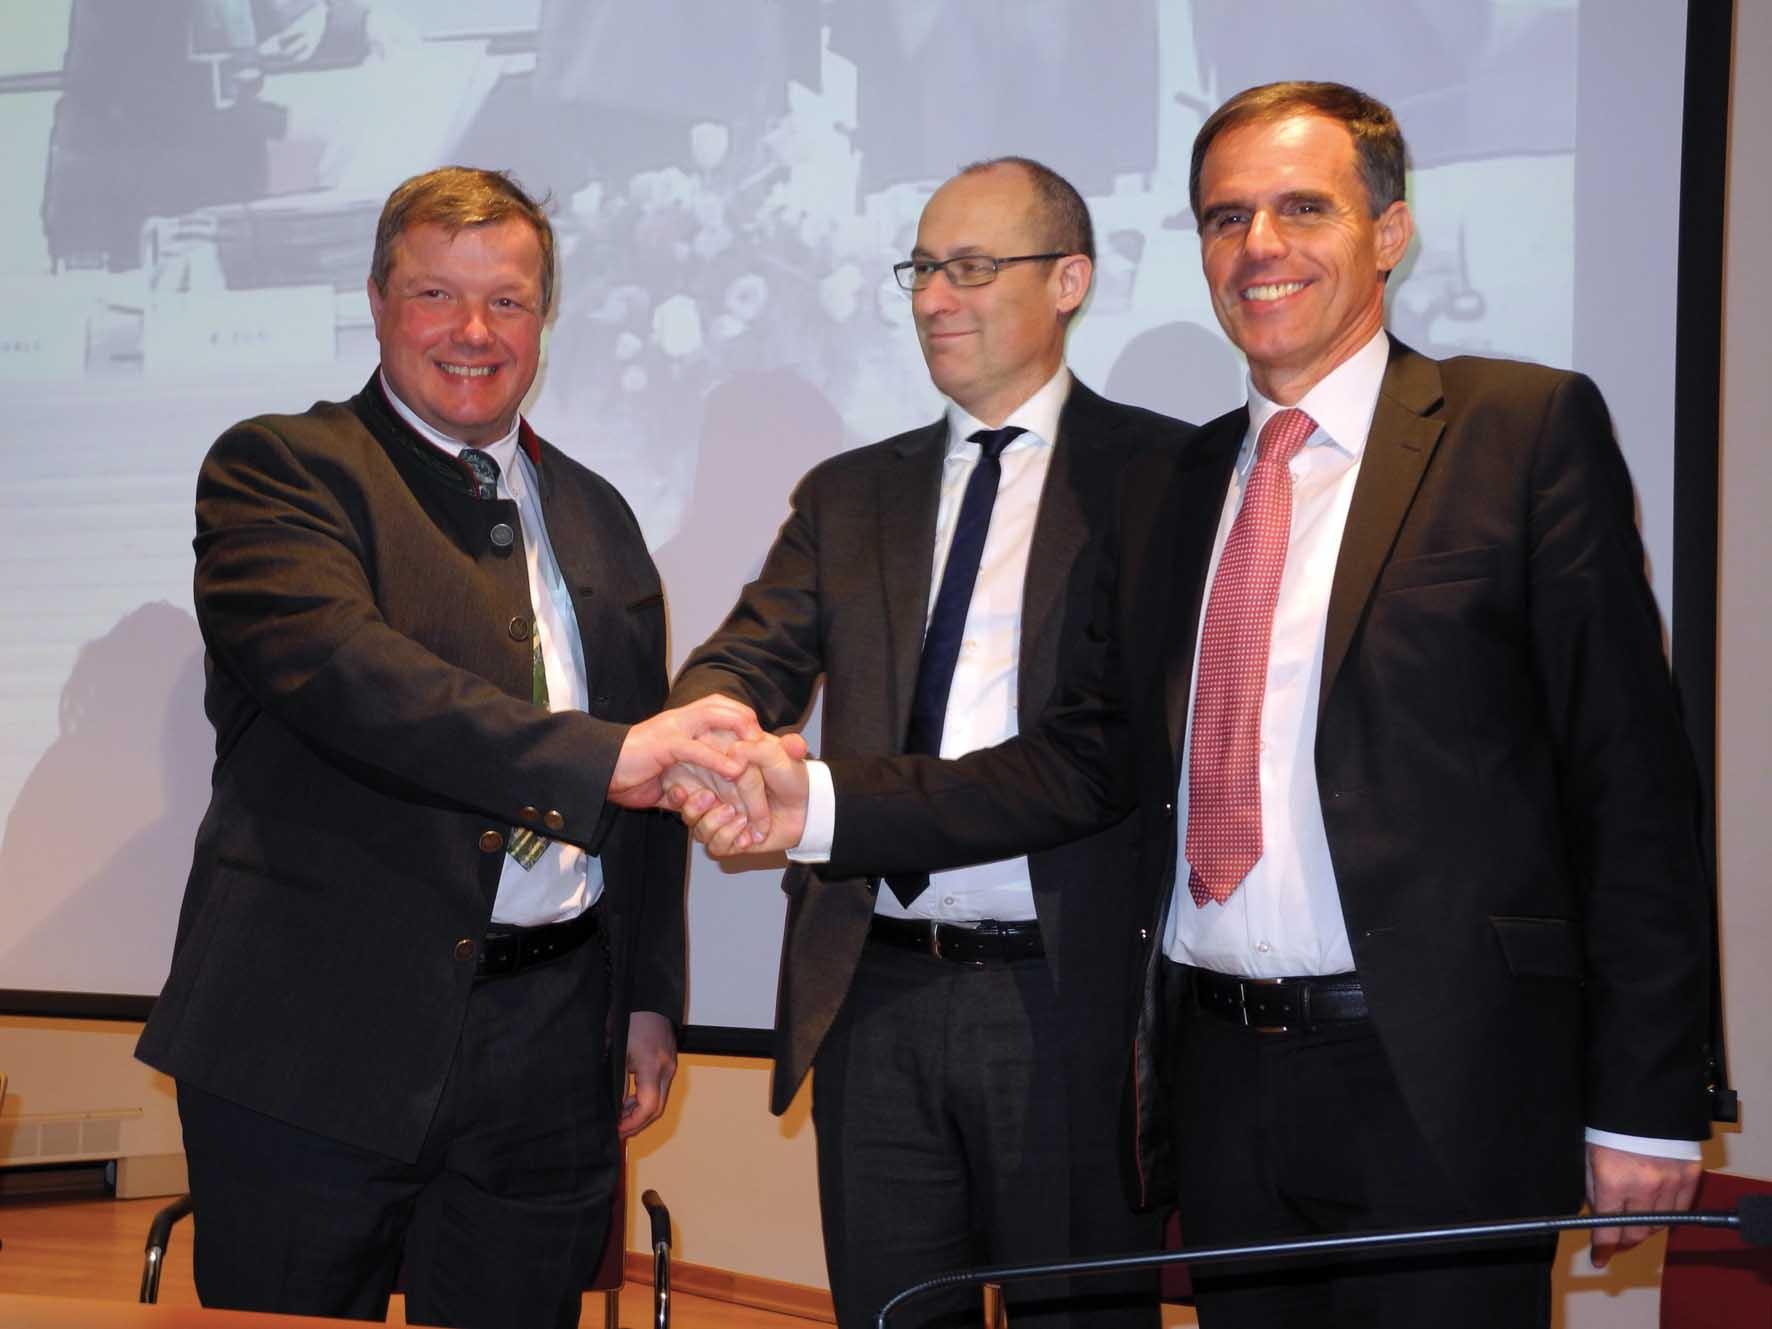 Euregio tirol assessori sanità PAB Richard Theiner Ugo Rossi PAT e Bernhard Tilg Tirol 1